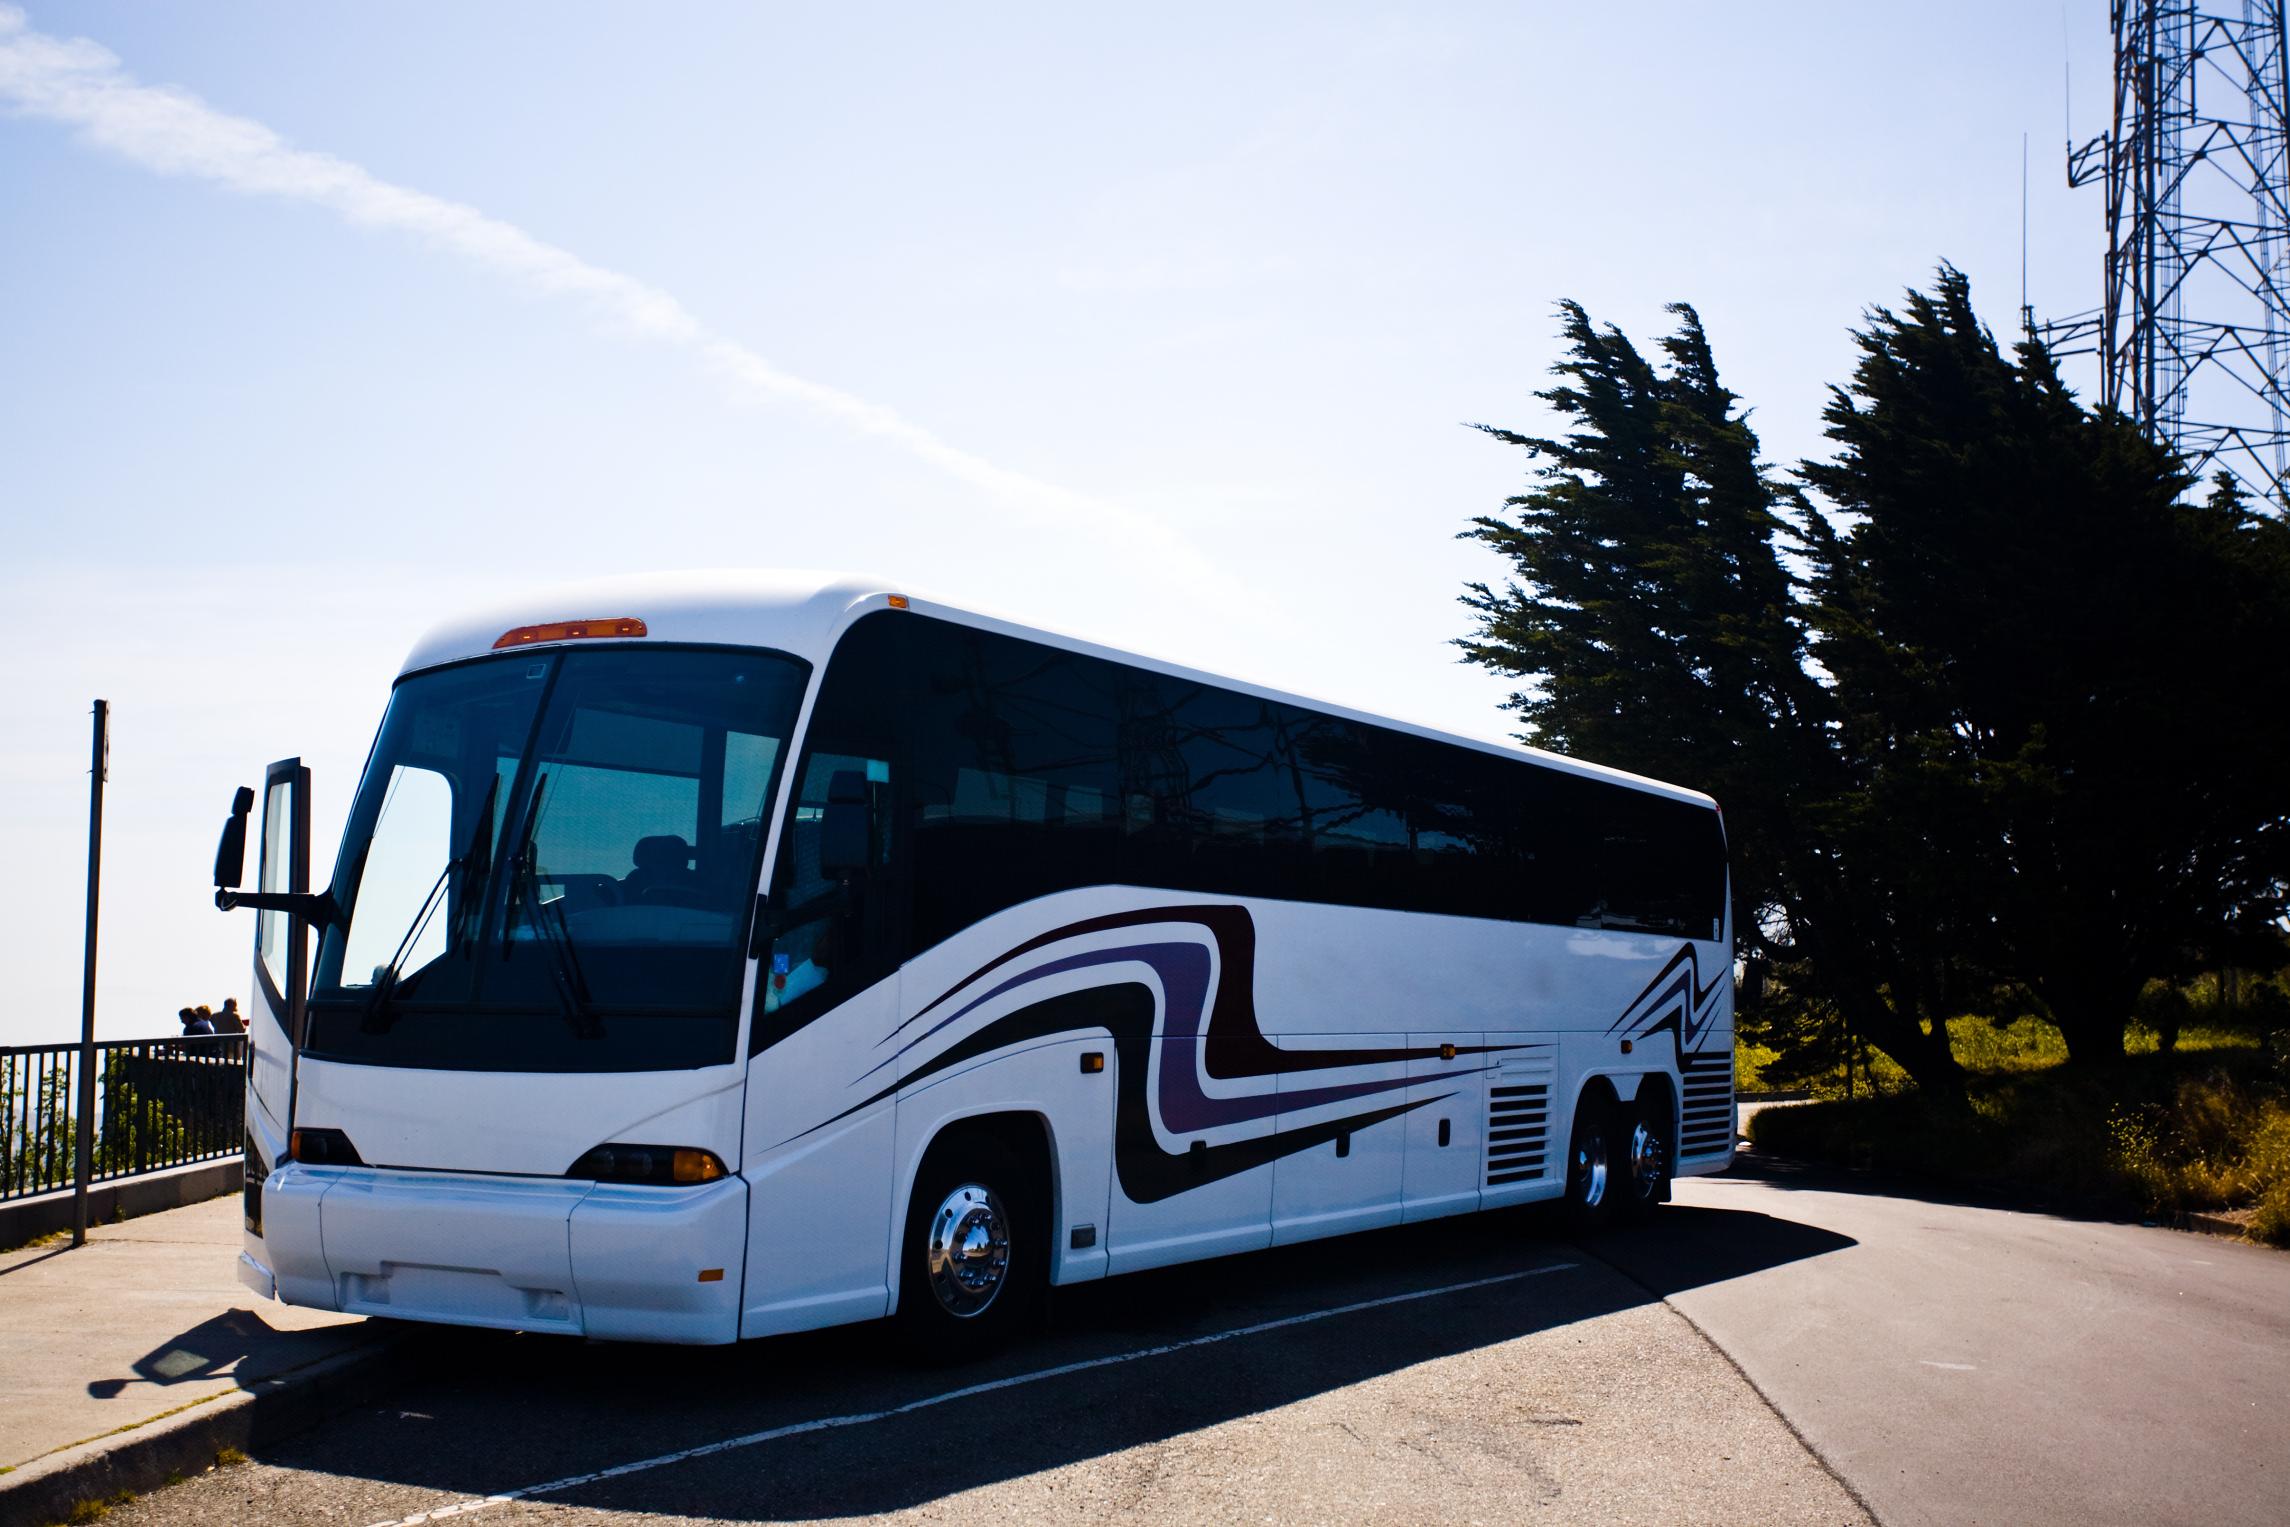 casino bus trips from austin tx to oklahoma